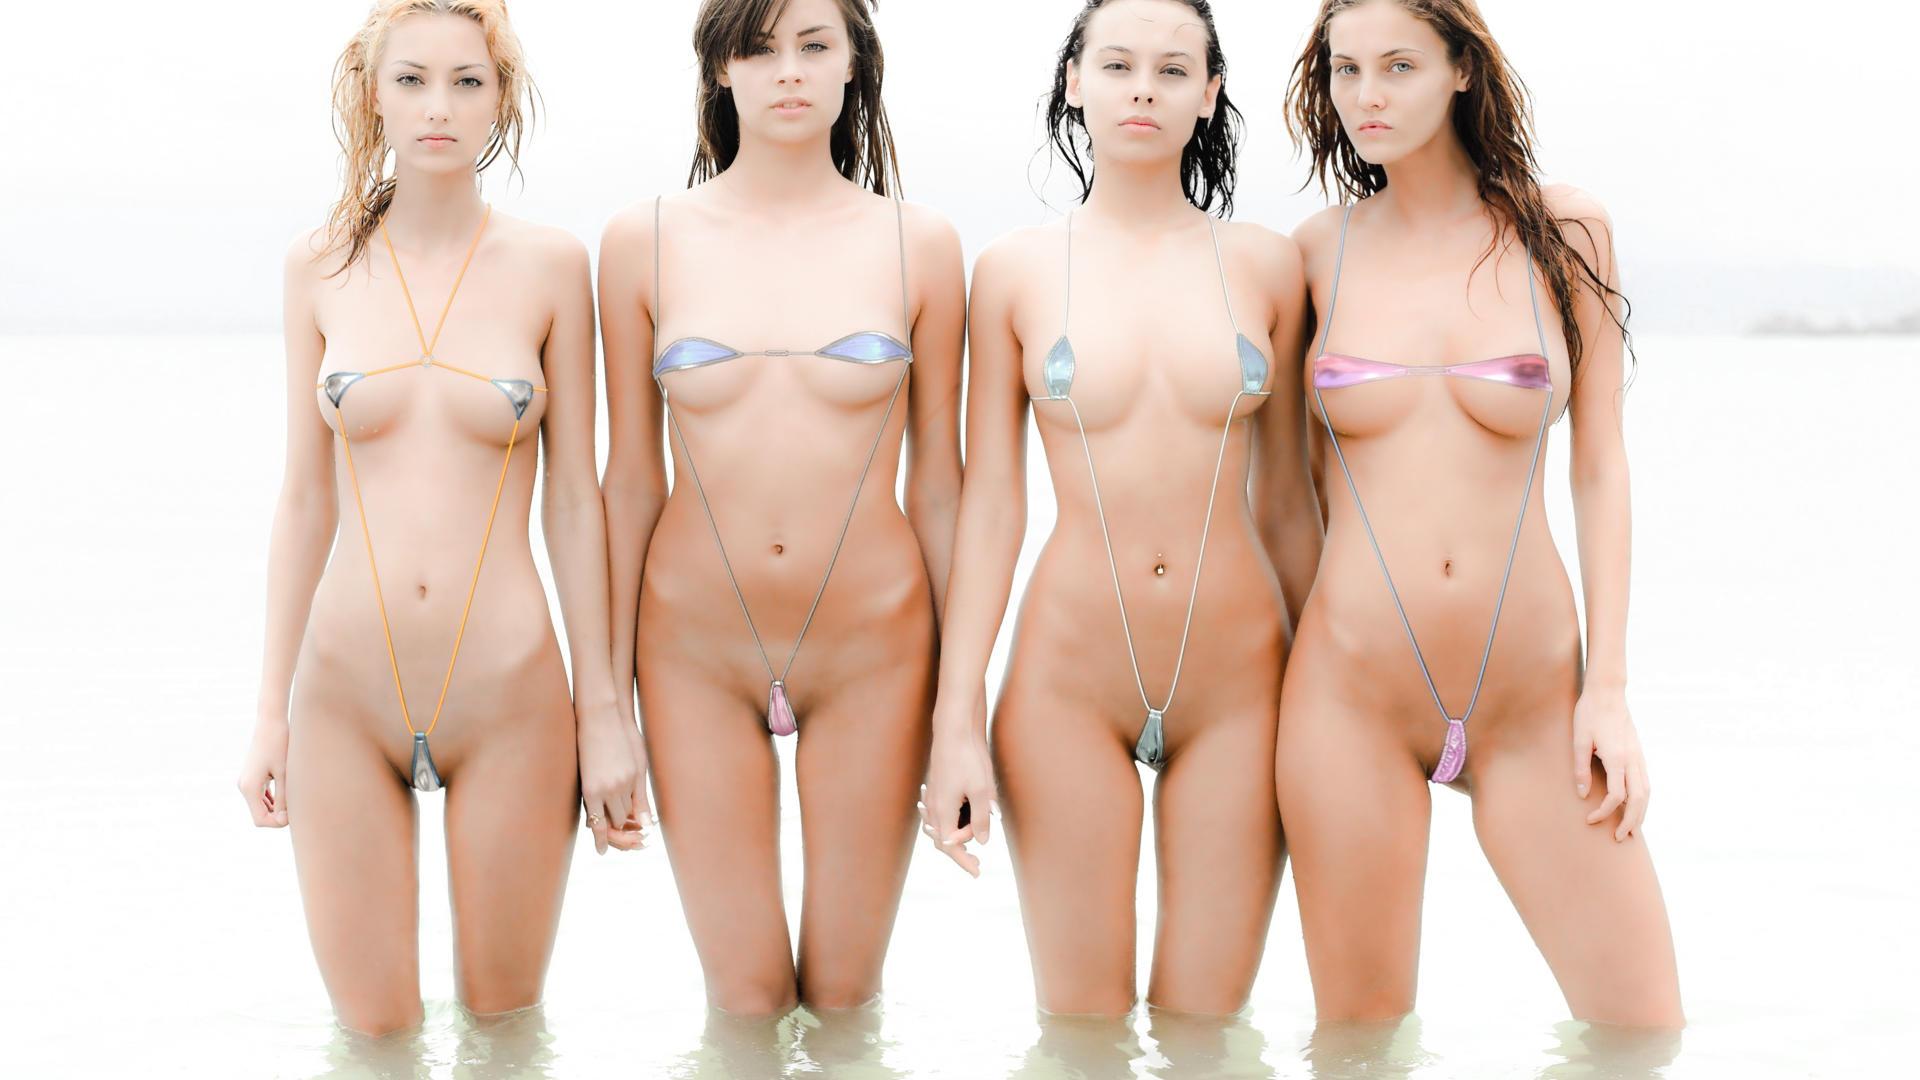 Shower 1080 bikini pics love